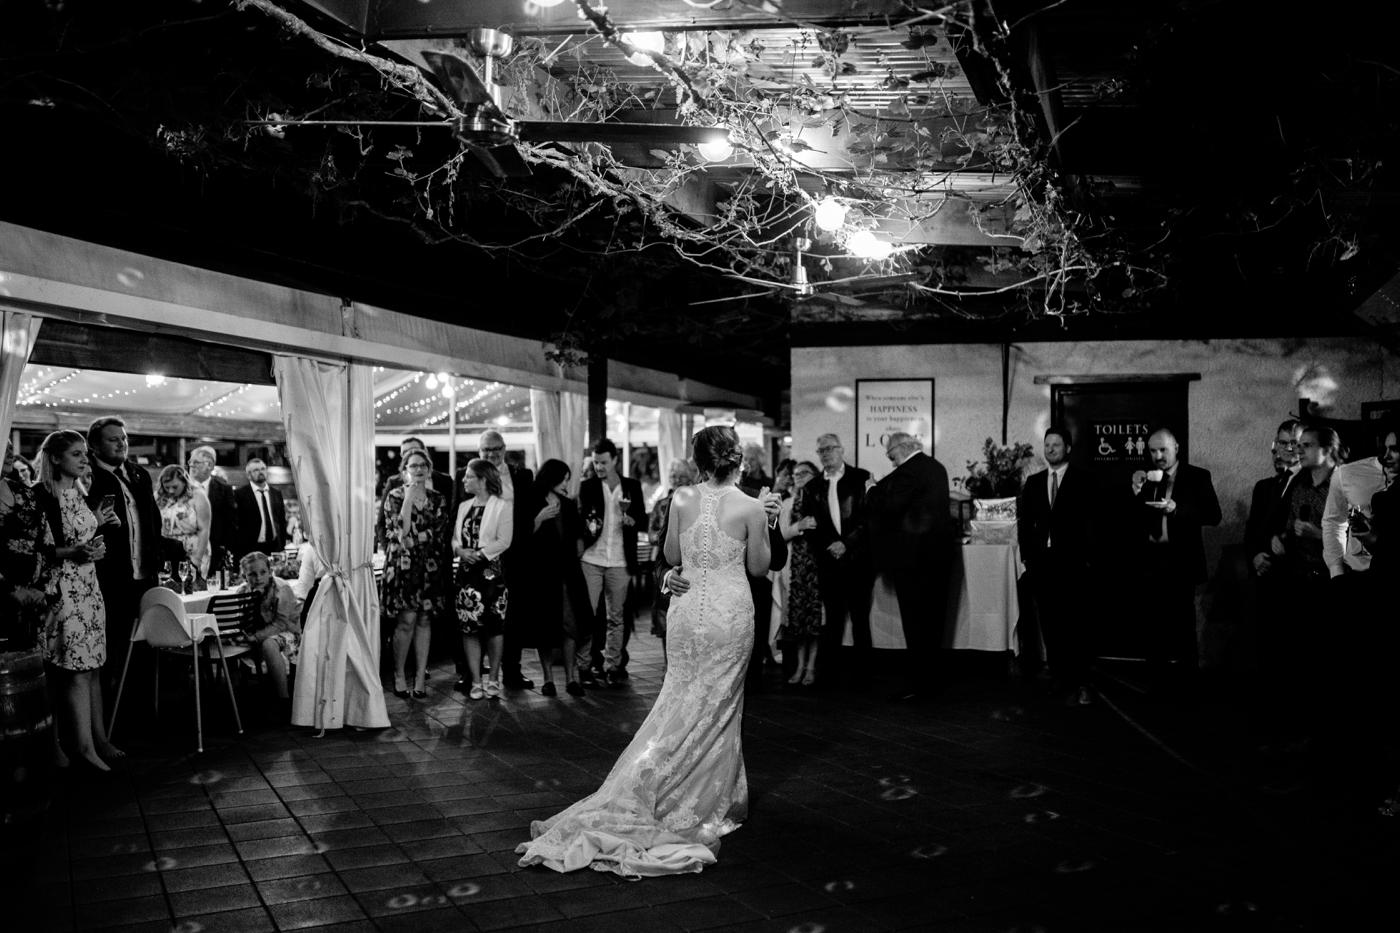 Erin & Ryan - Natural Wedding Photographer in Adelaide - Maximillians Wedding - Simple and Modern Wedding Photographer - Katherine Schultz - www.katherineschultzphotography.com_0064.jpg